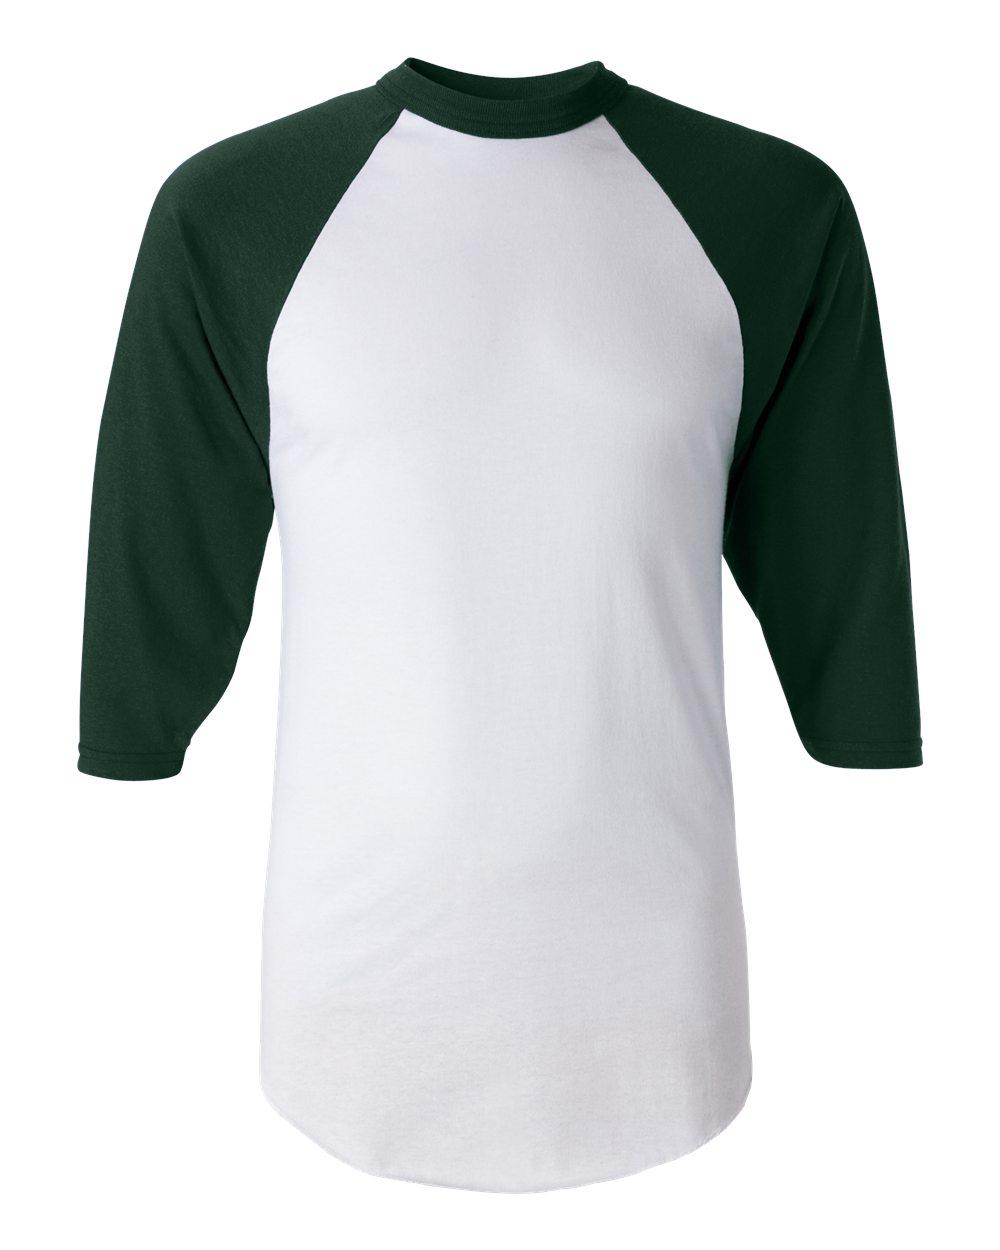 the best attitude b5af2 b1c0a Augusta Sportswear 4420 - Men's Three-Quarter Sleeve Baseball Jersey